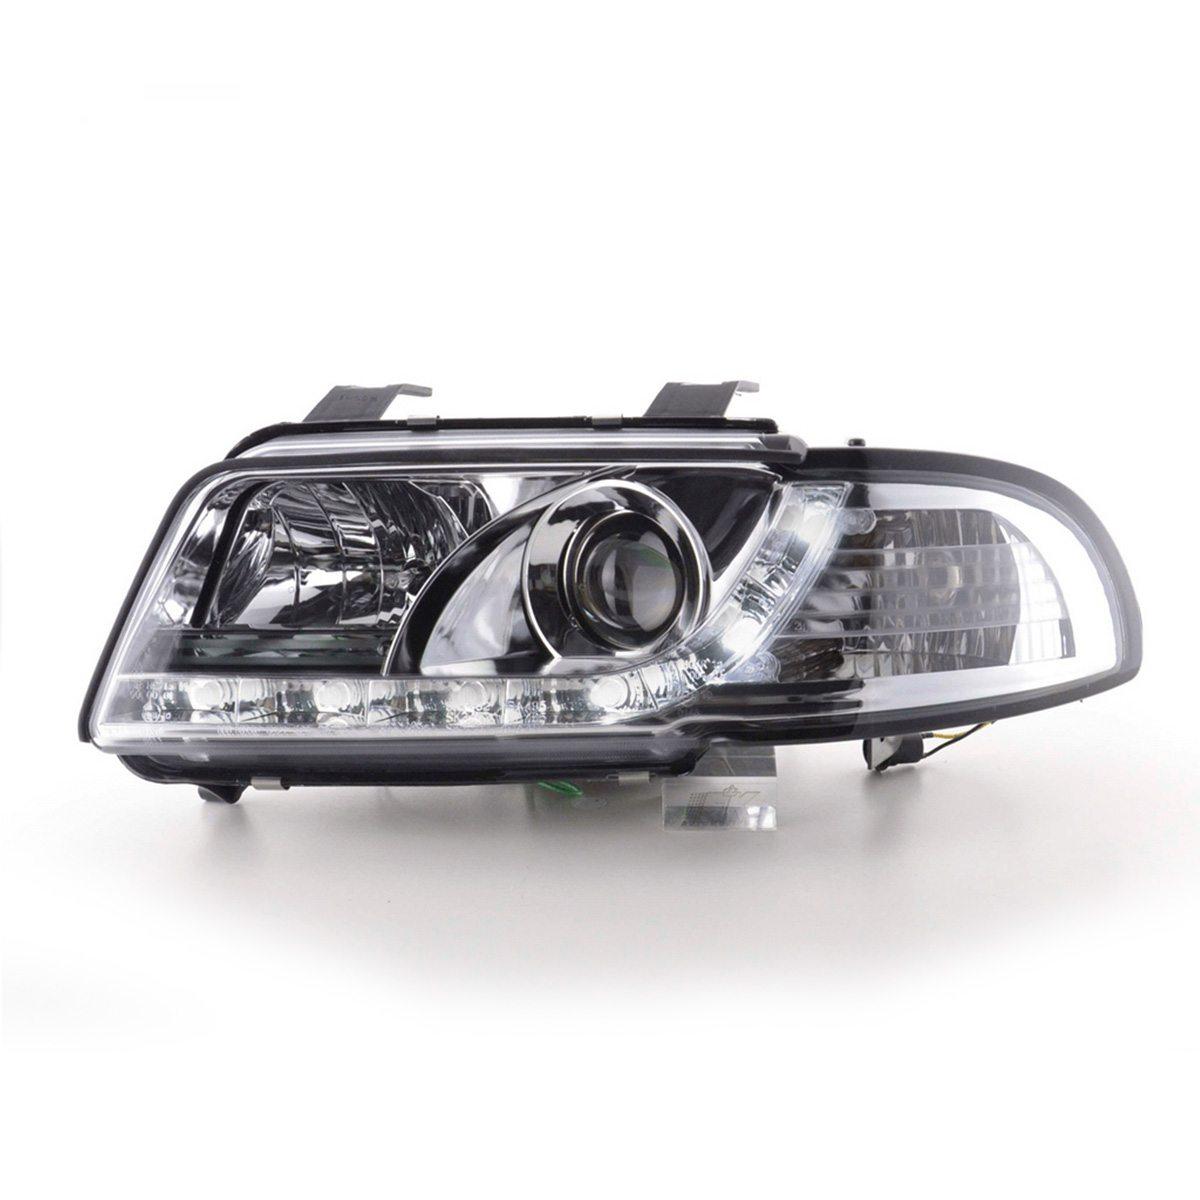 Audi-A4-B5-LimAvant-96-00-Faróis-Angel-Eyes-Dayline-Cromados-2